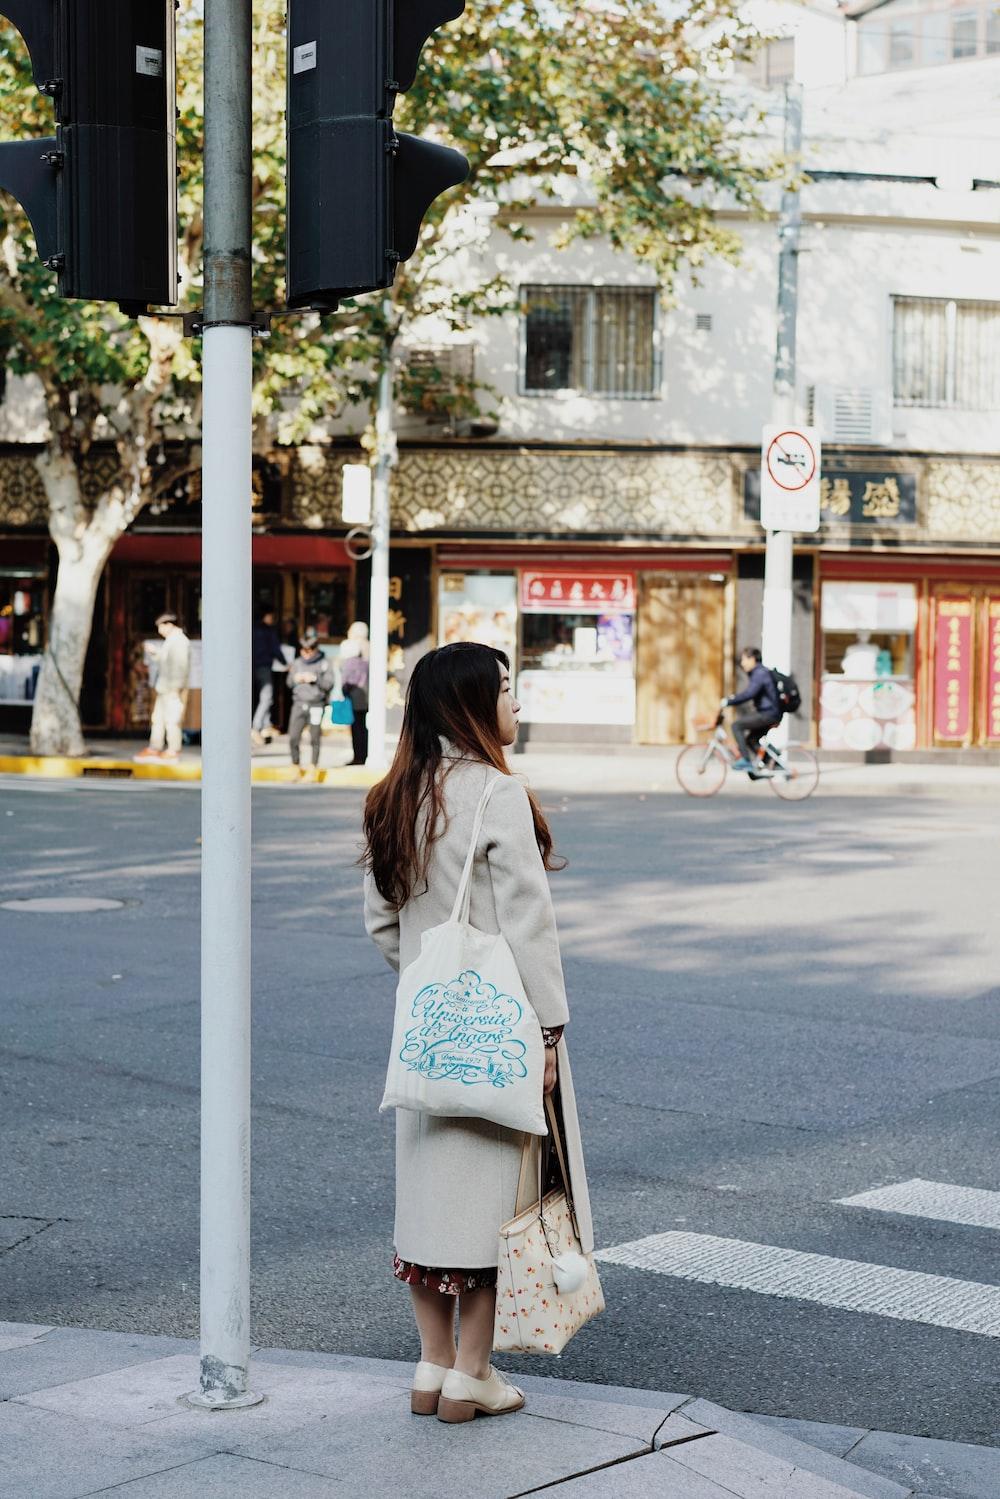 woman about to cross on crosswalk